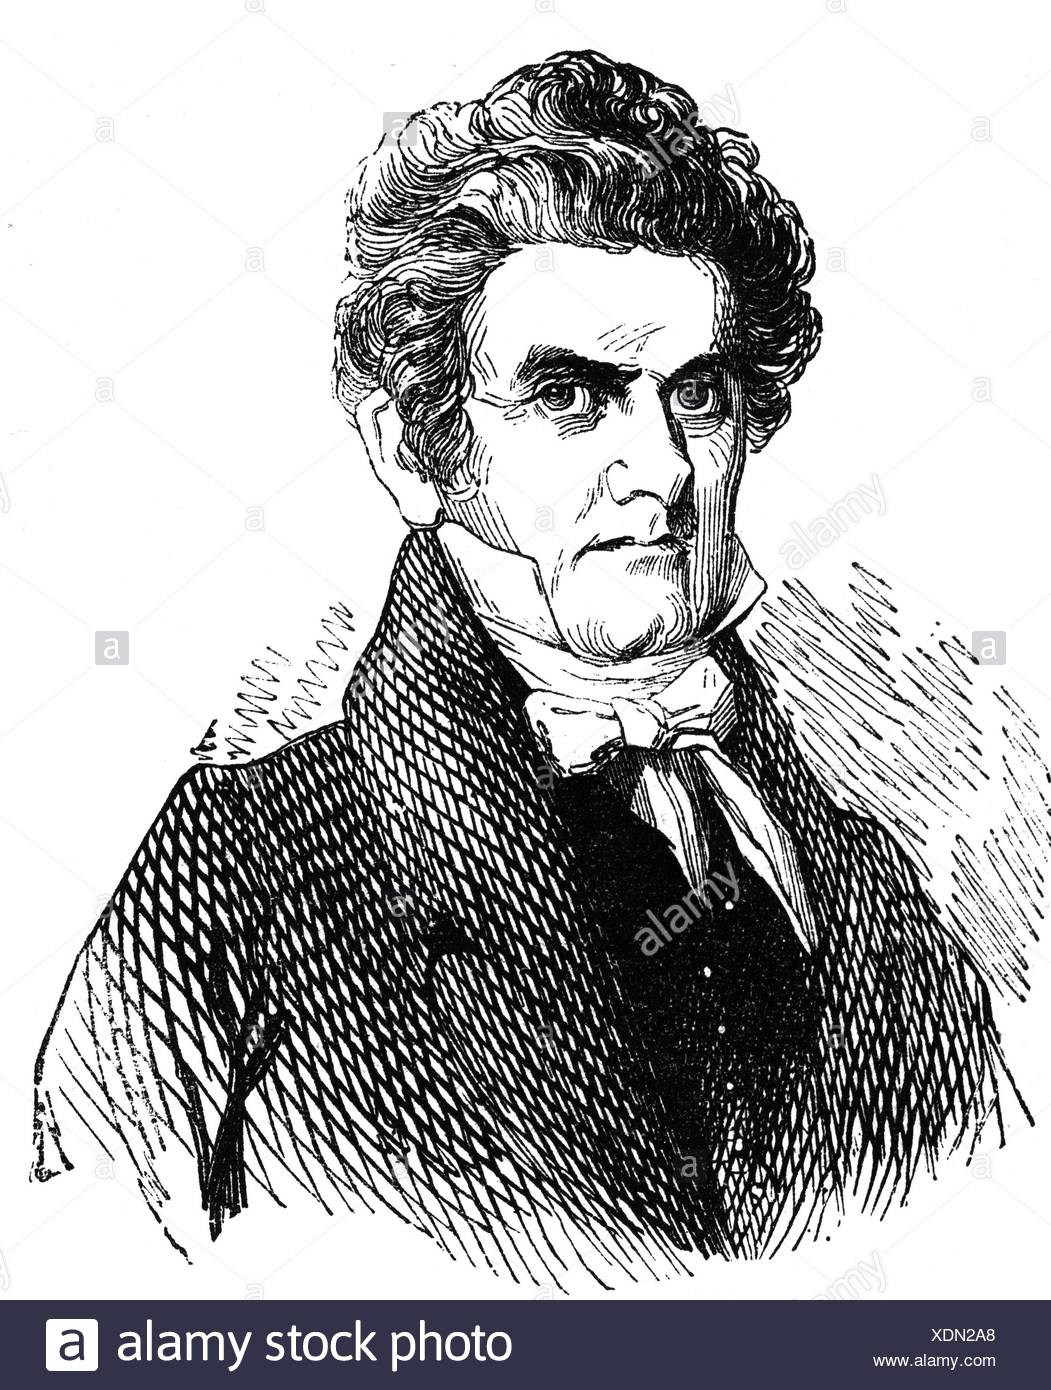 Calhoun, John Caldwell, 18.3.1782 - 31.3.1860, American politician, Vice President of the USA 4.3.1825 - 28.12.1832, portrait, wood engraving, 19th century, Stock Photo